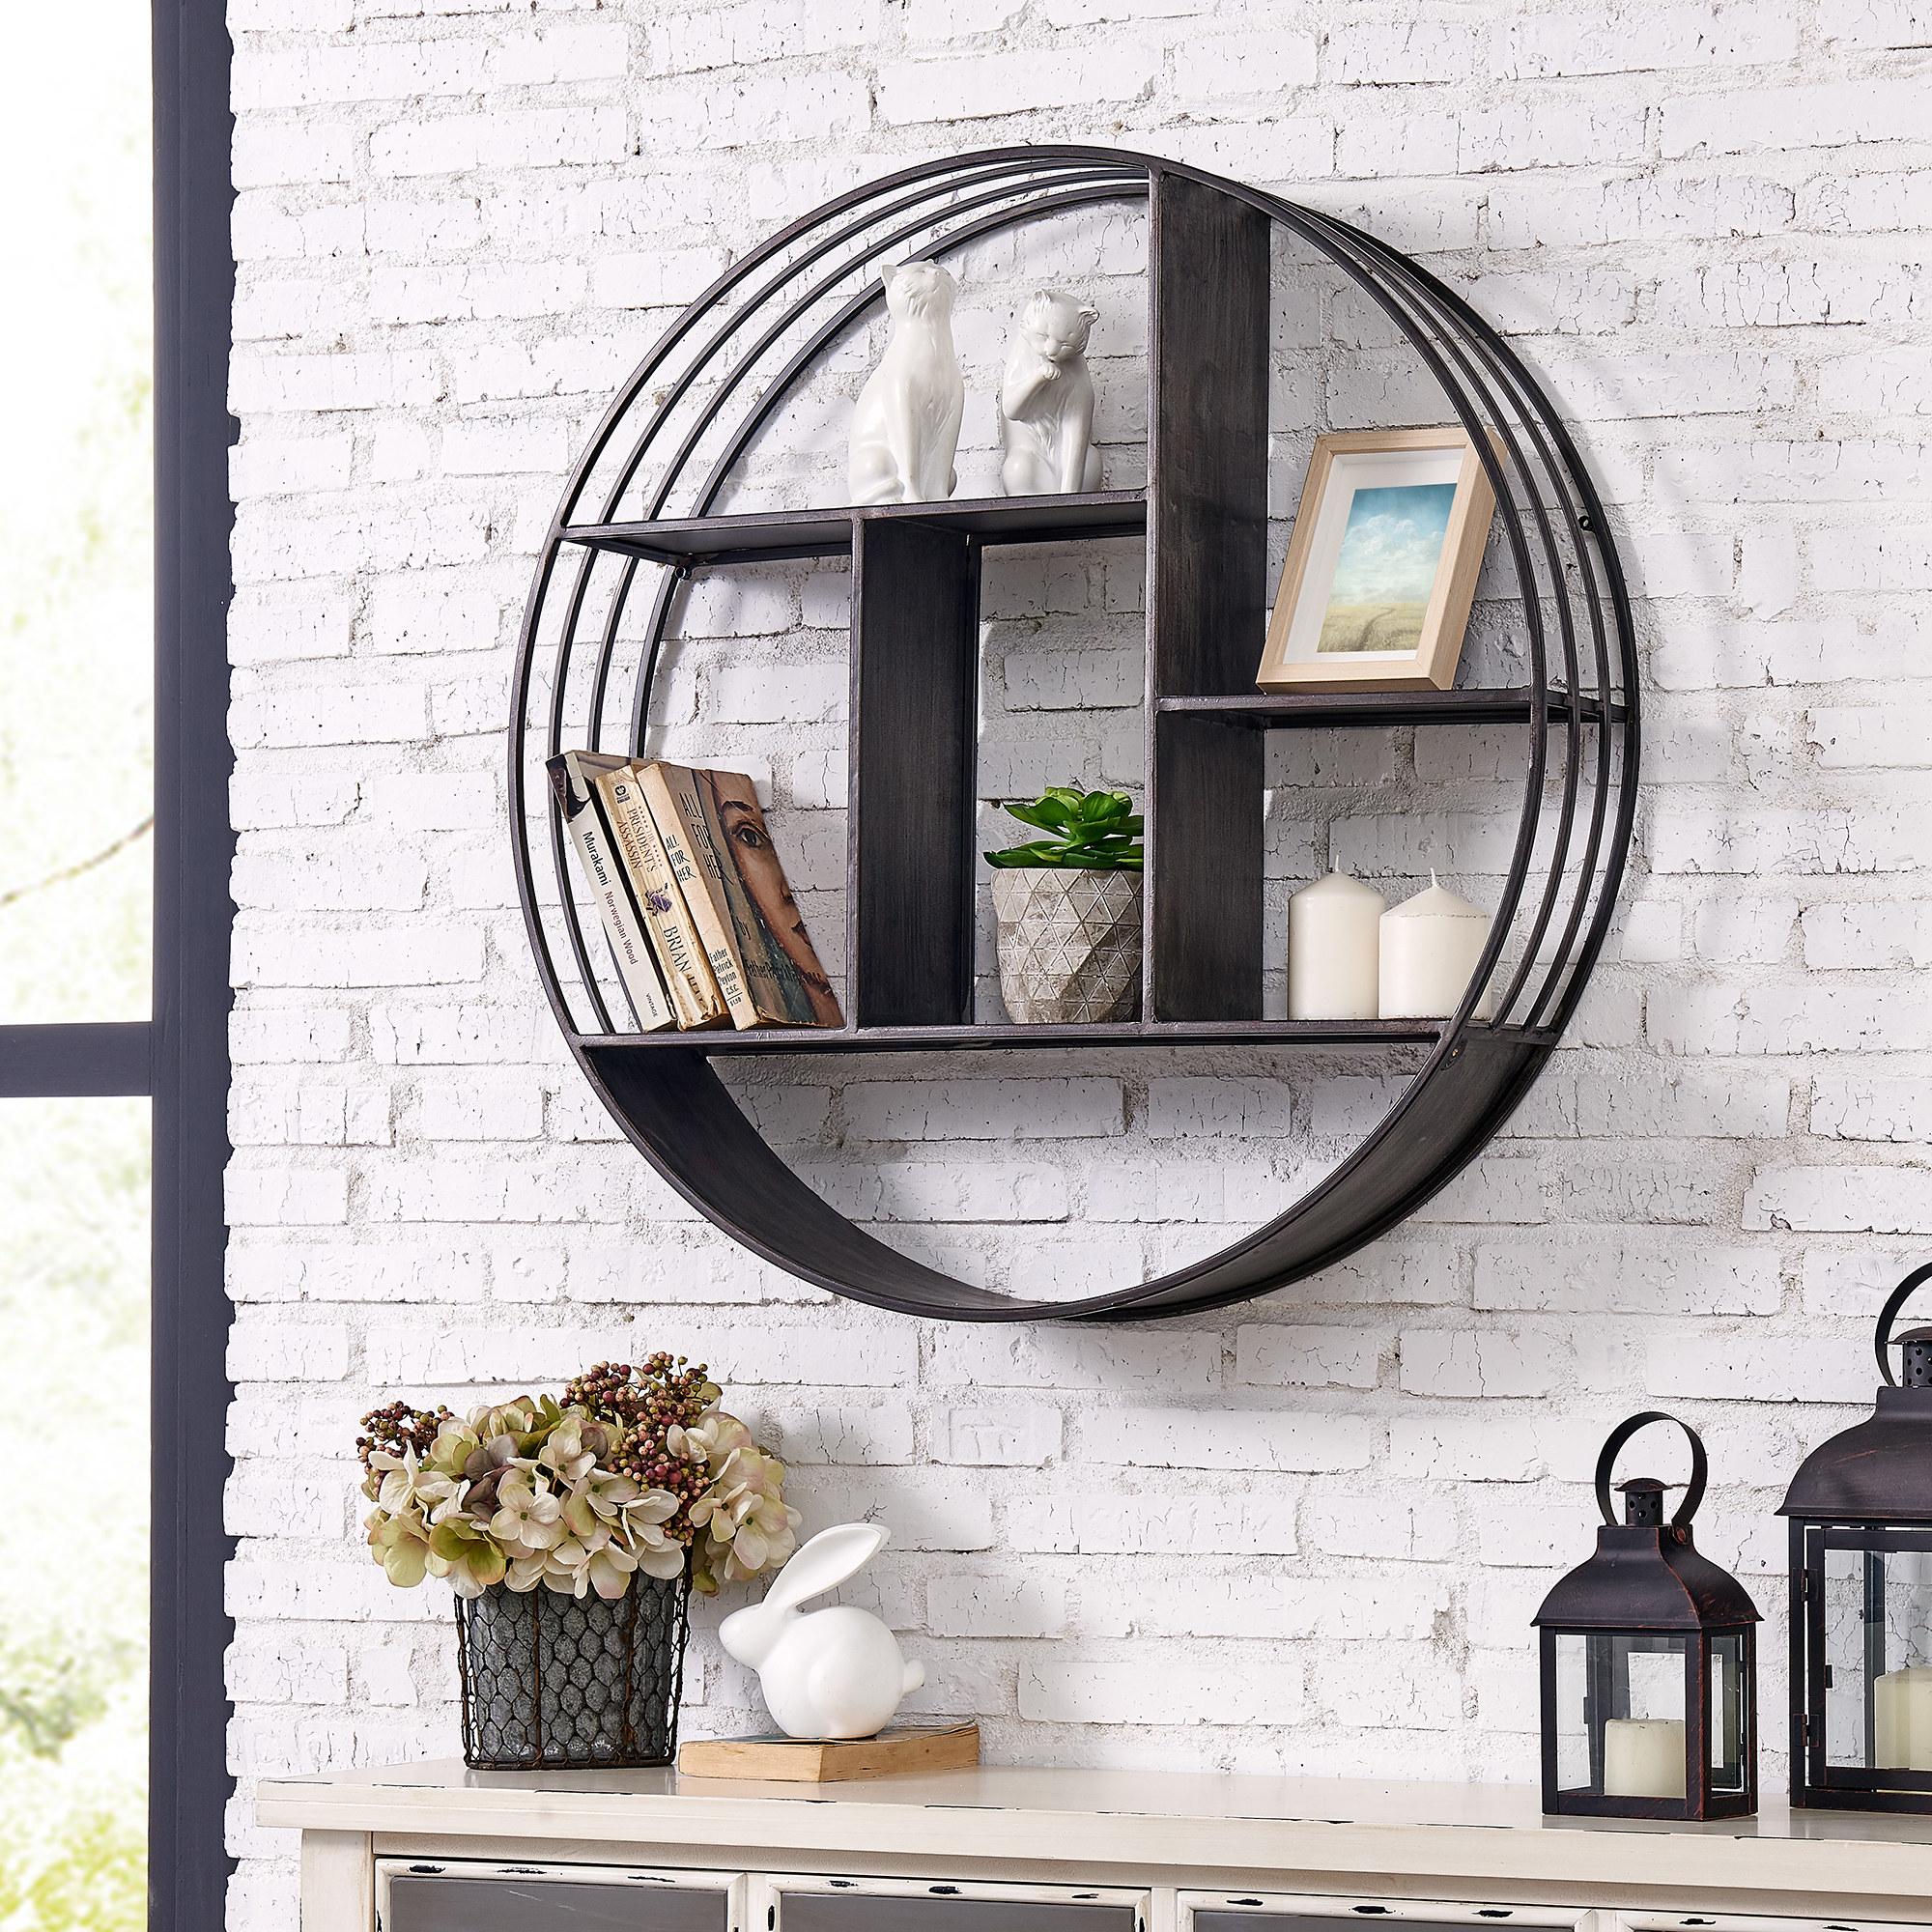 A metallic gray circle shelf on a white brick wall